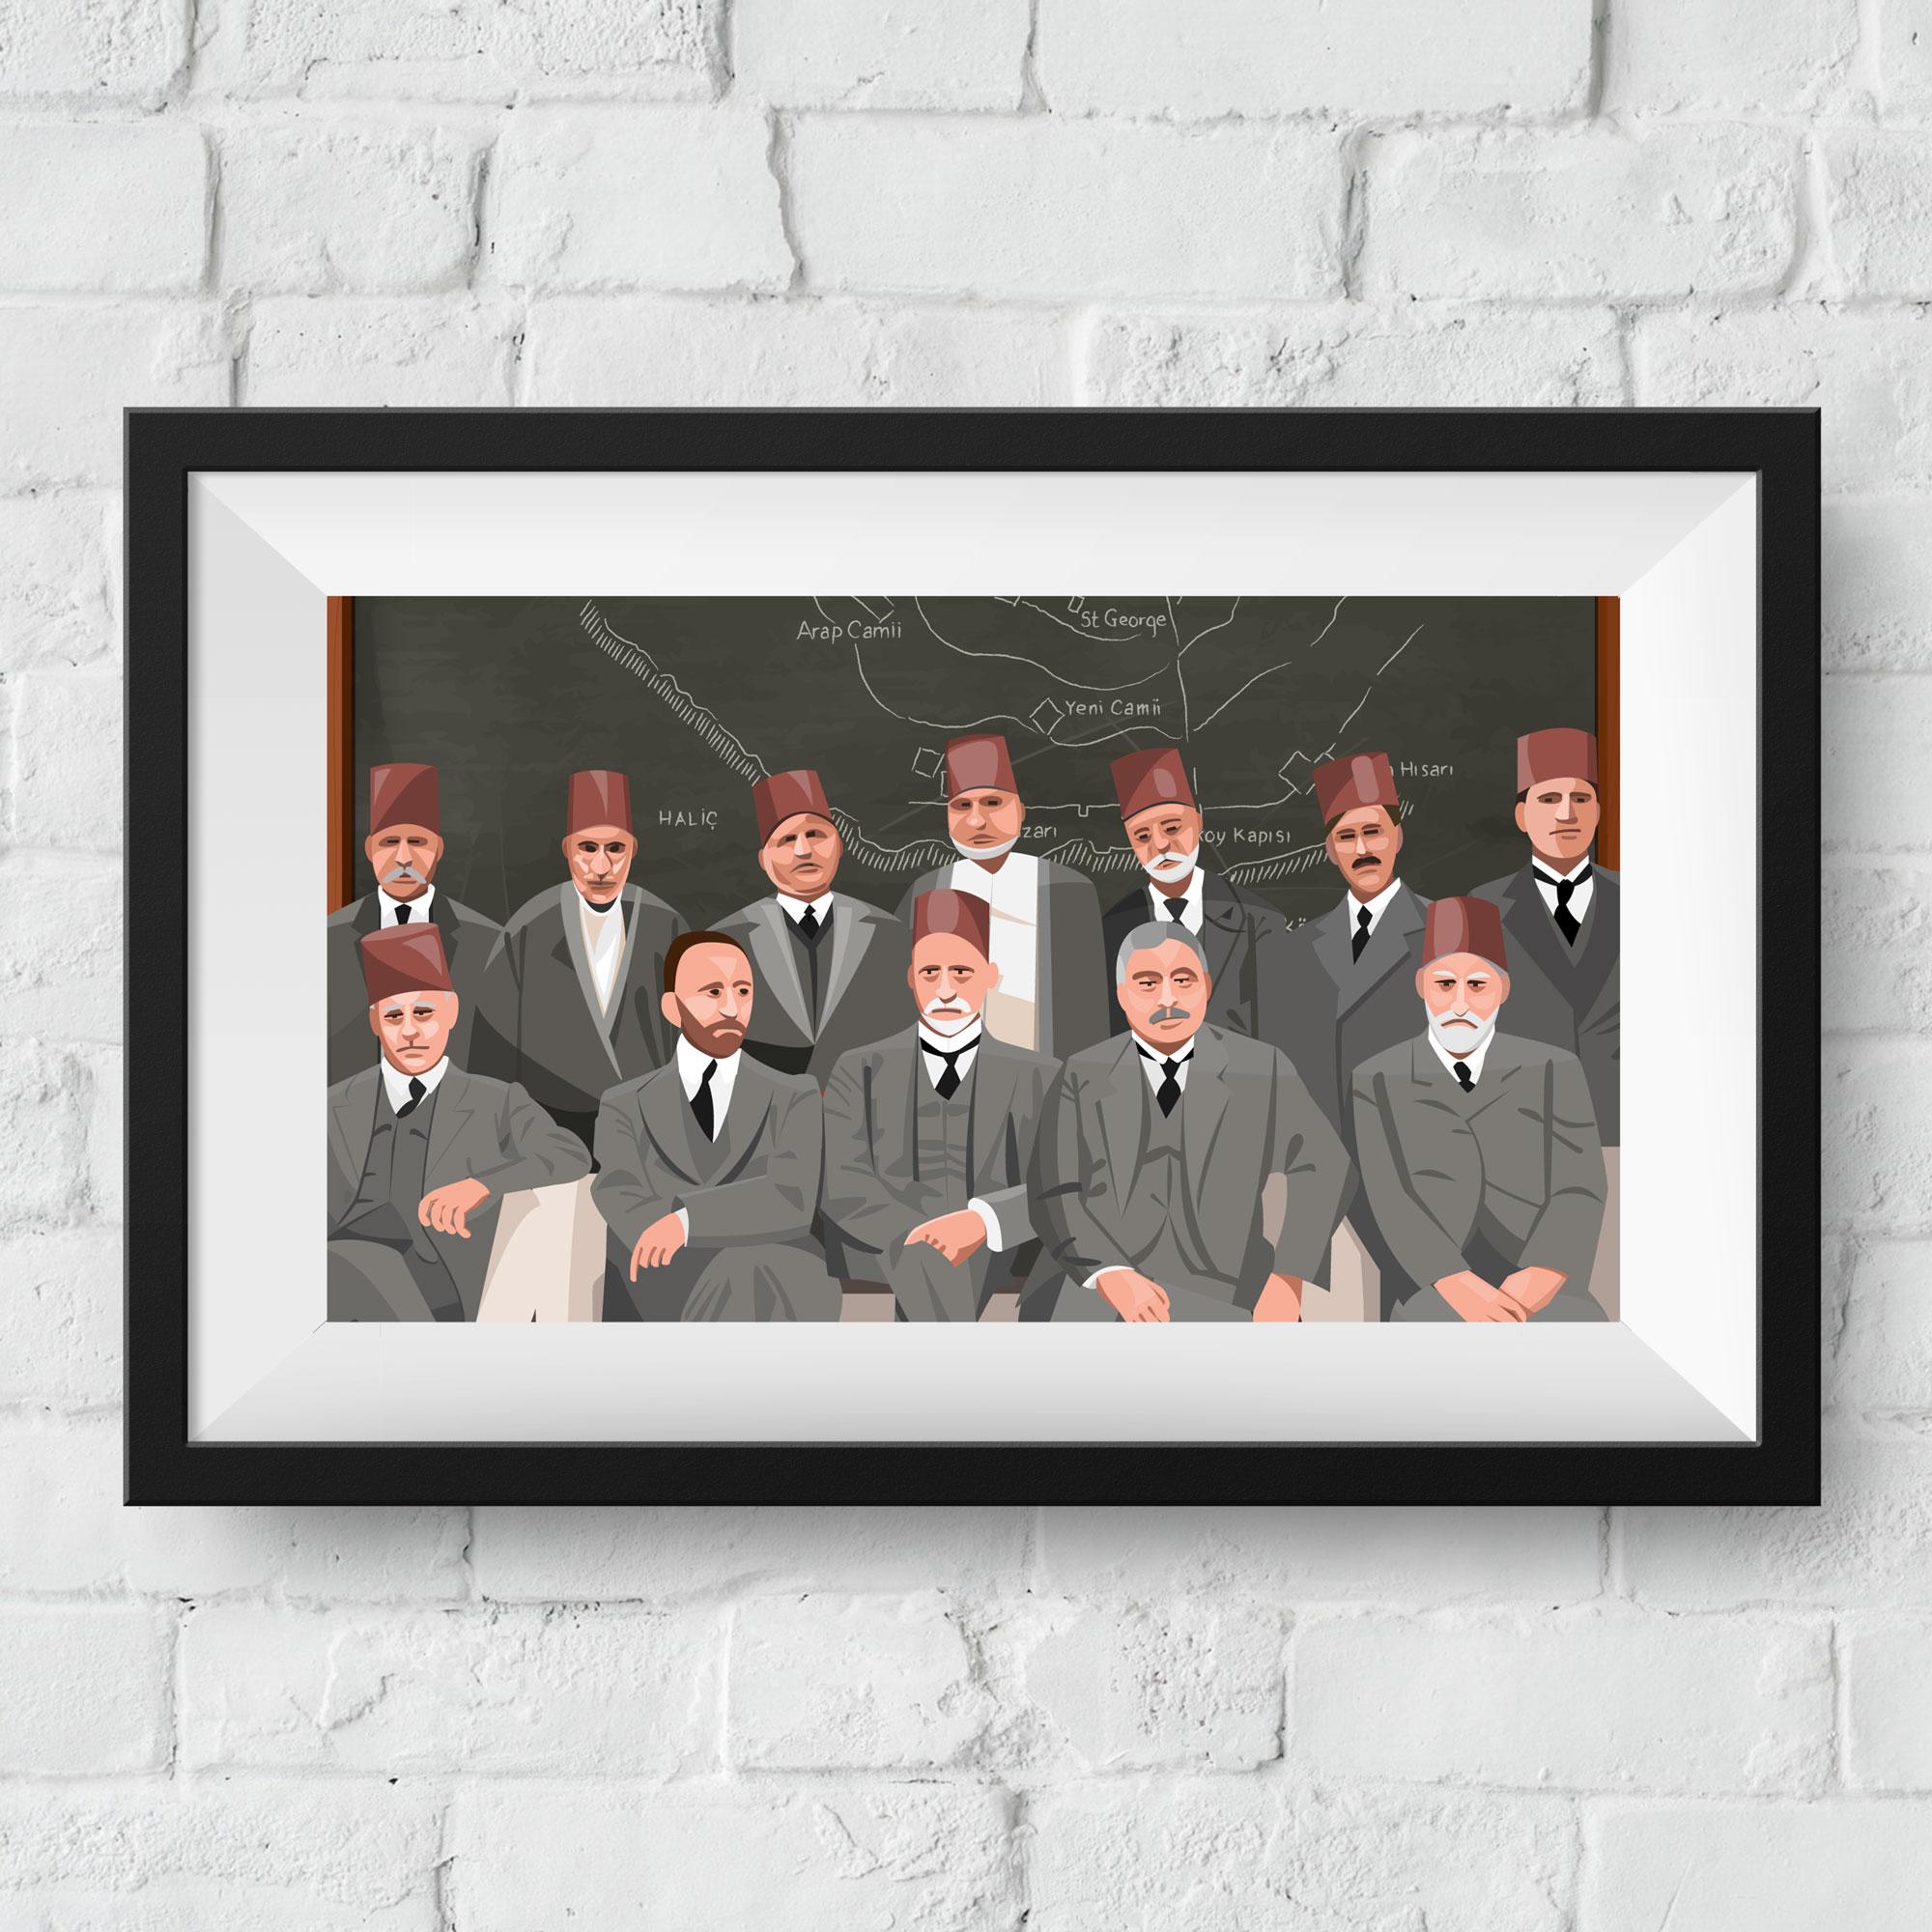 ottoman-framed